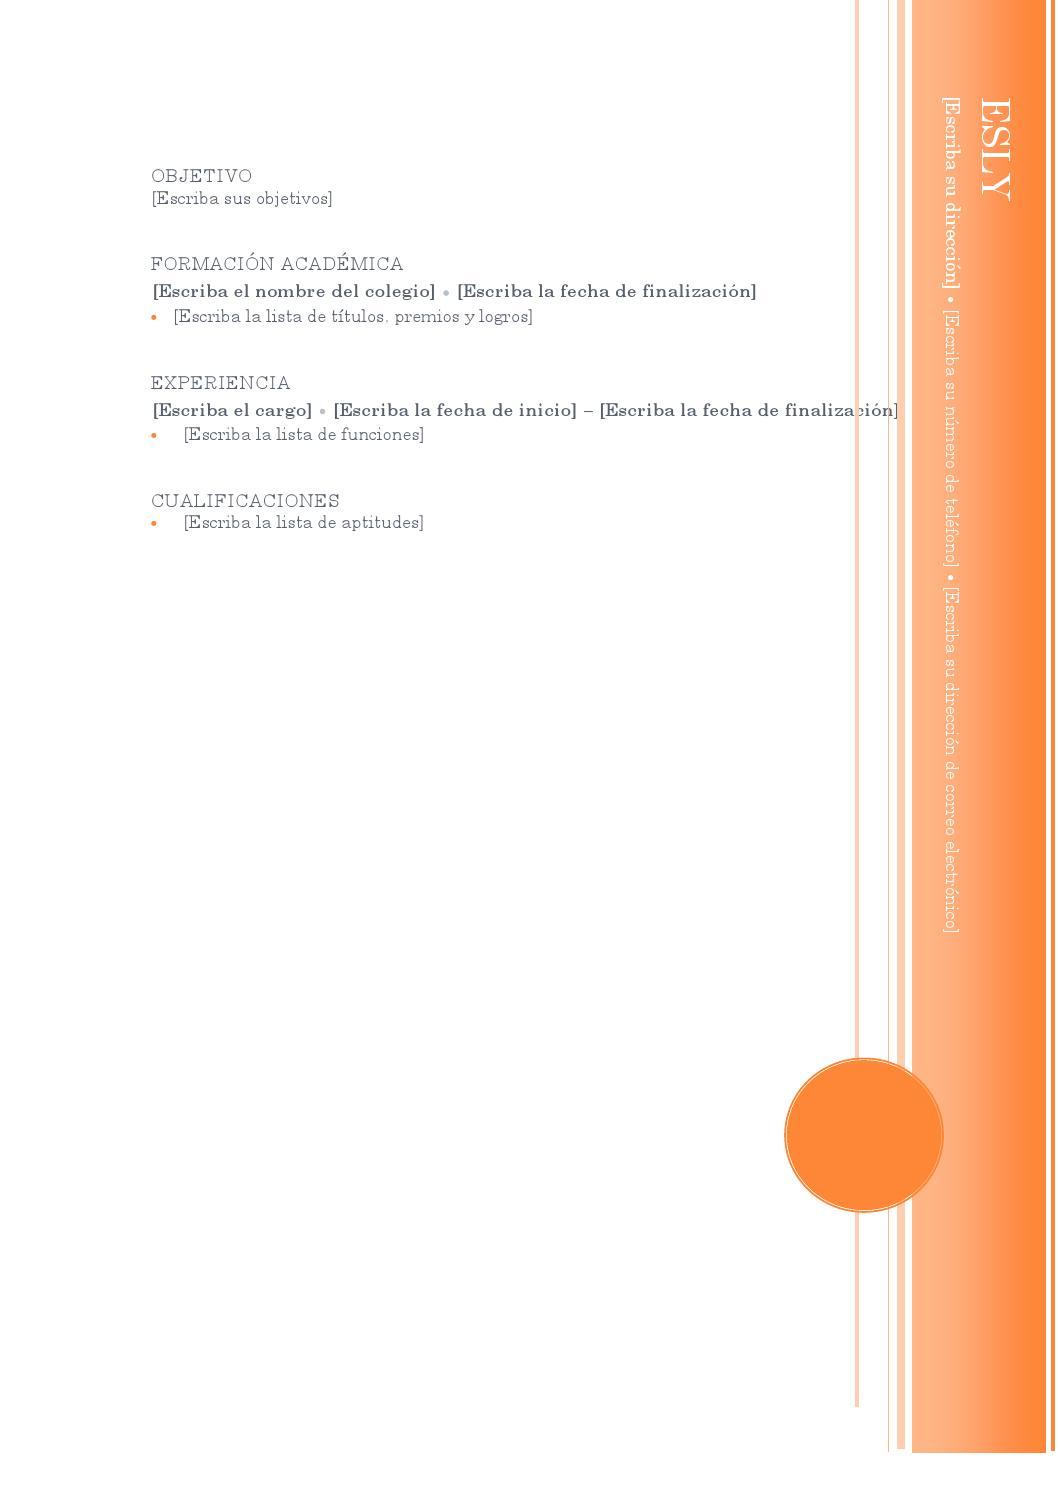 Plantilla curriculum mirador by esli reyes - issuu